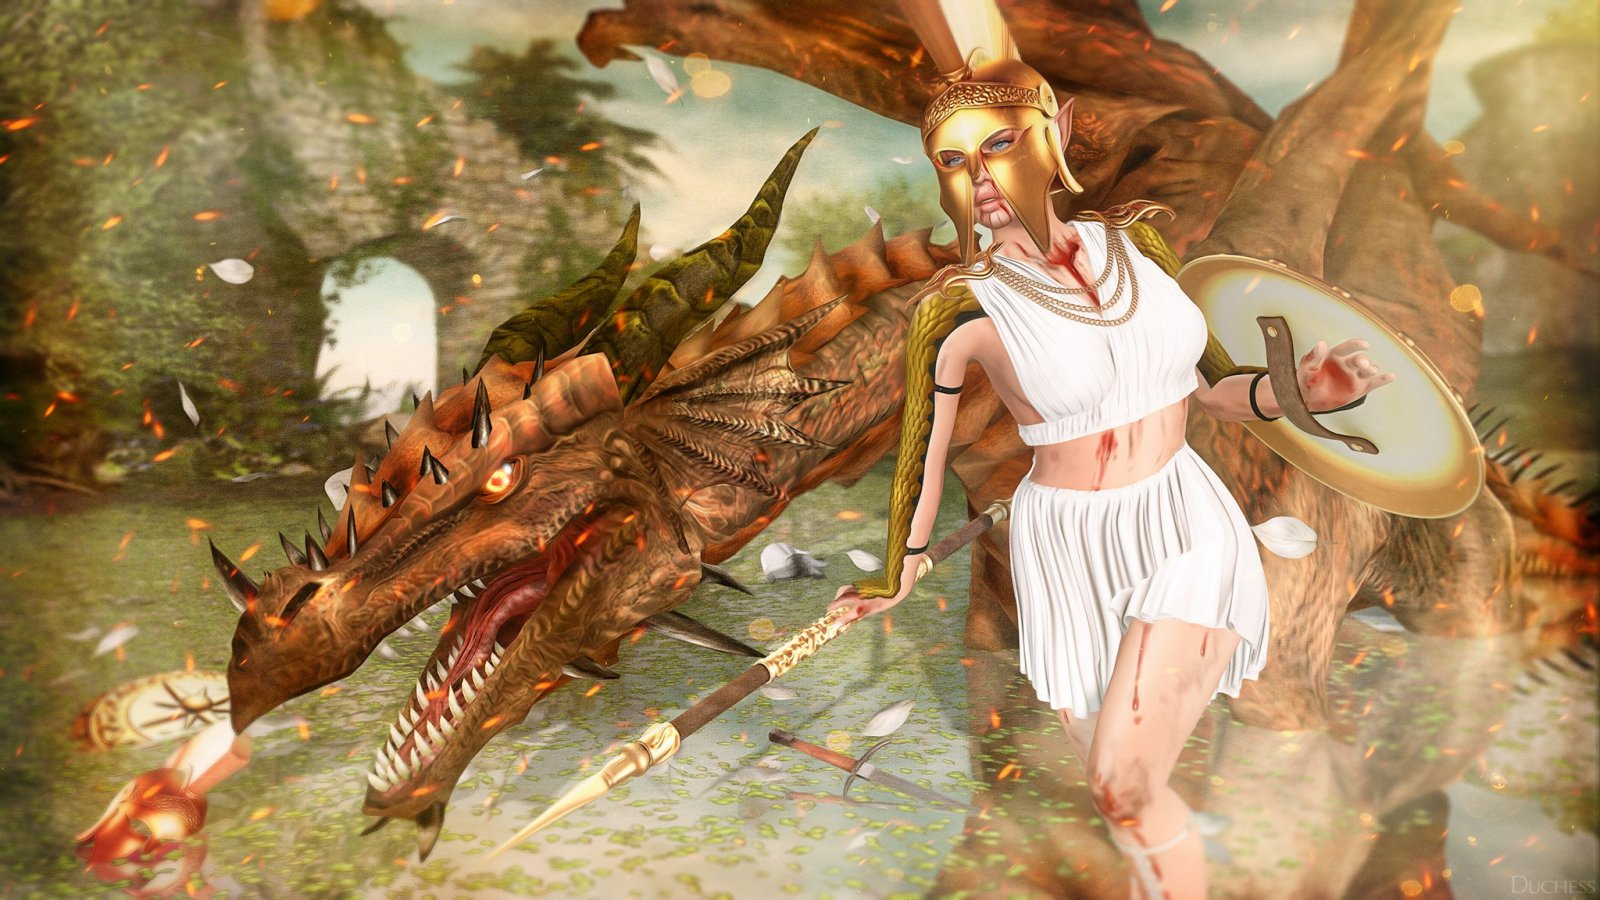 Athena and Draco